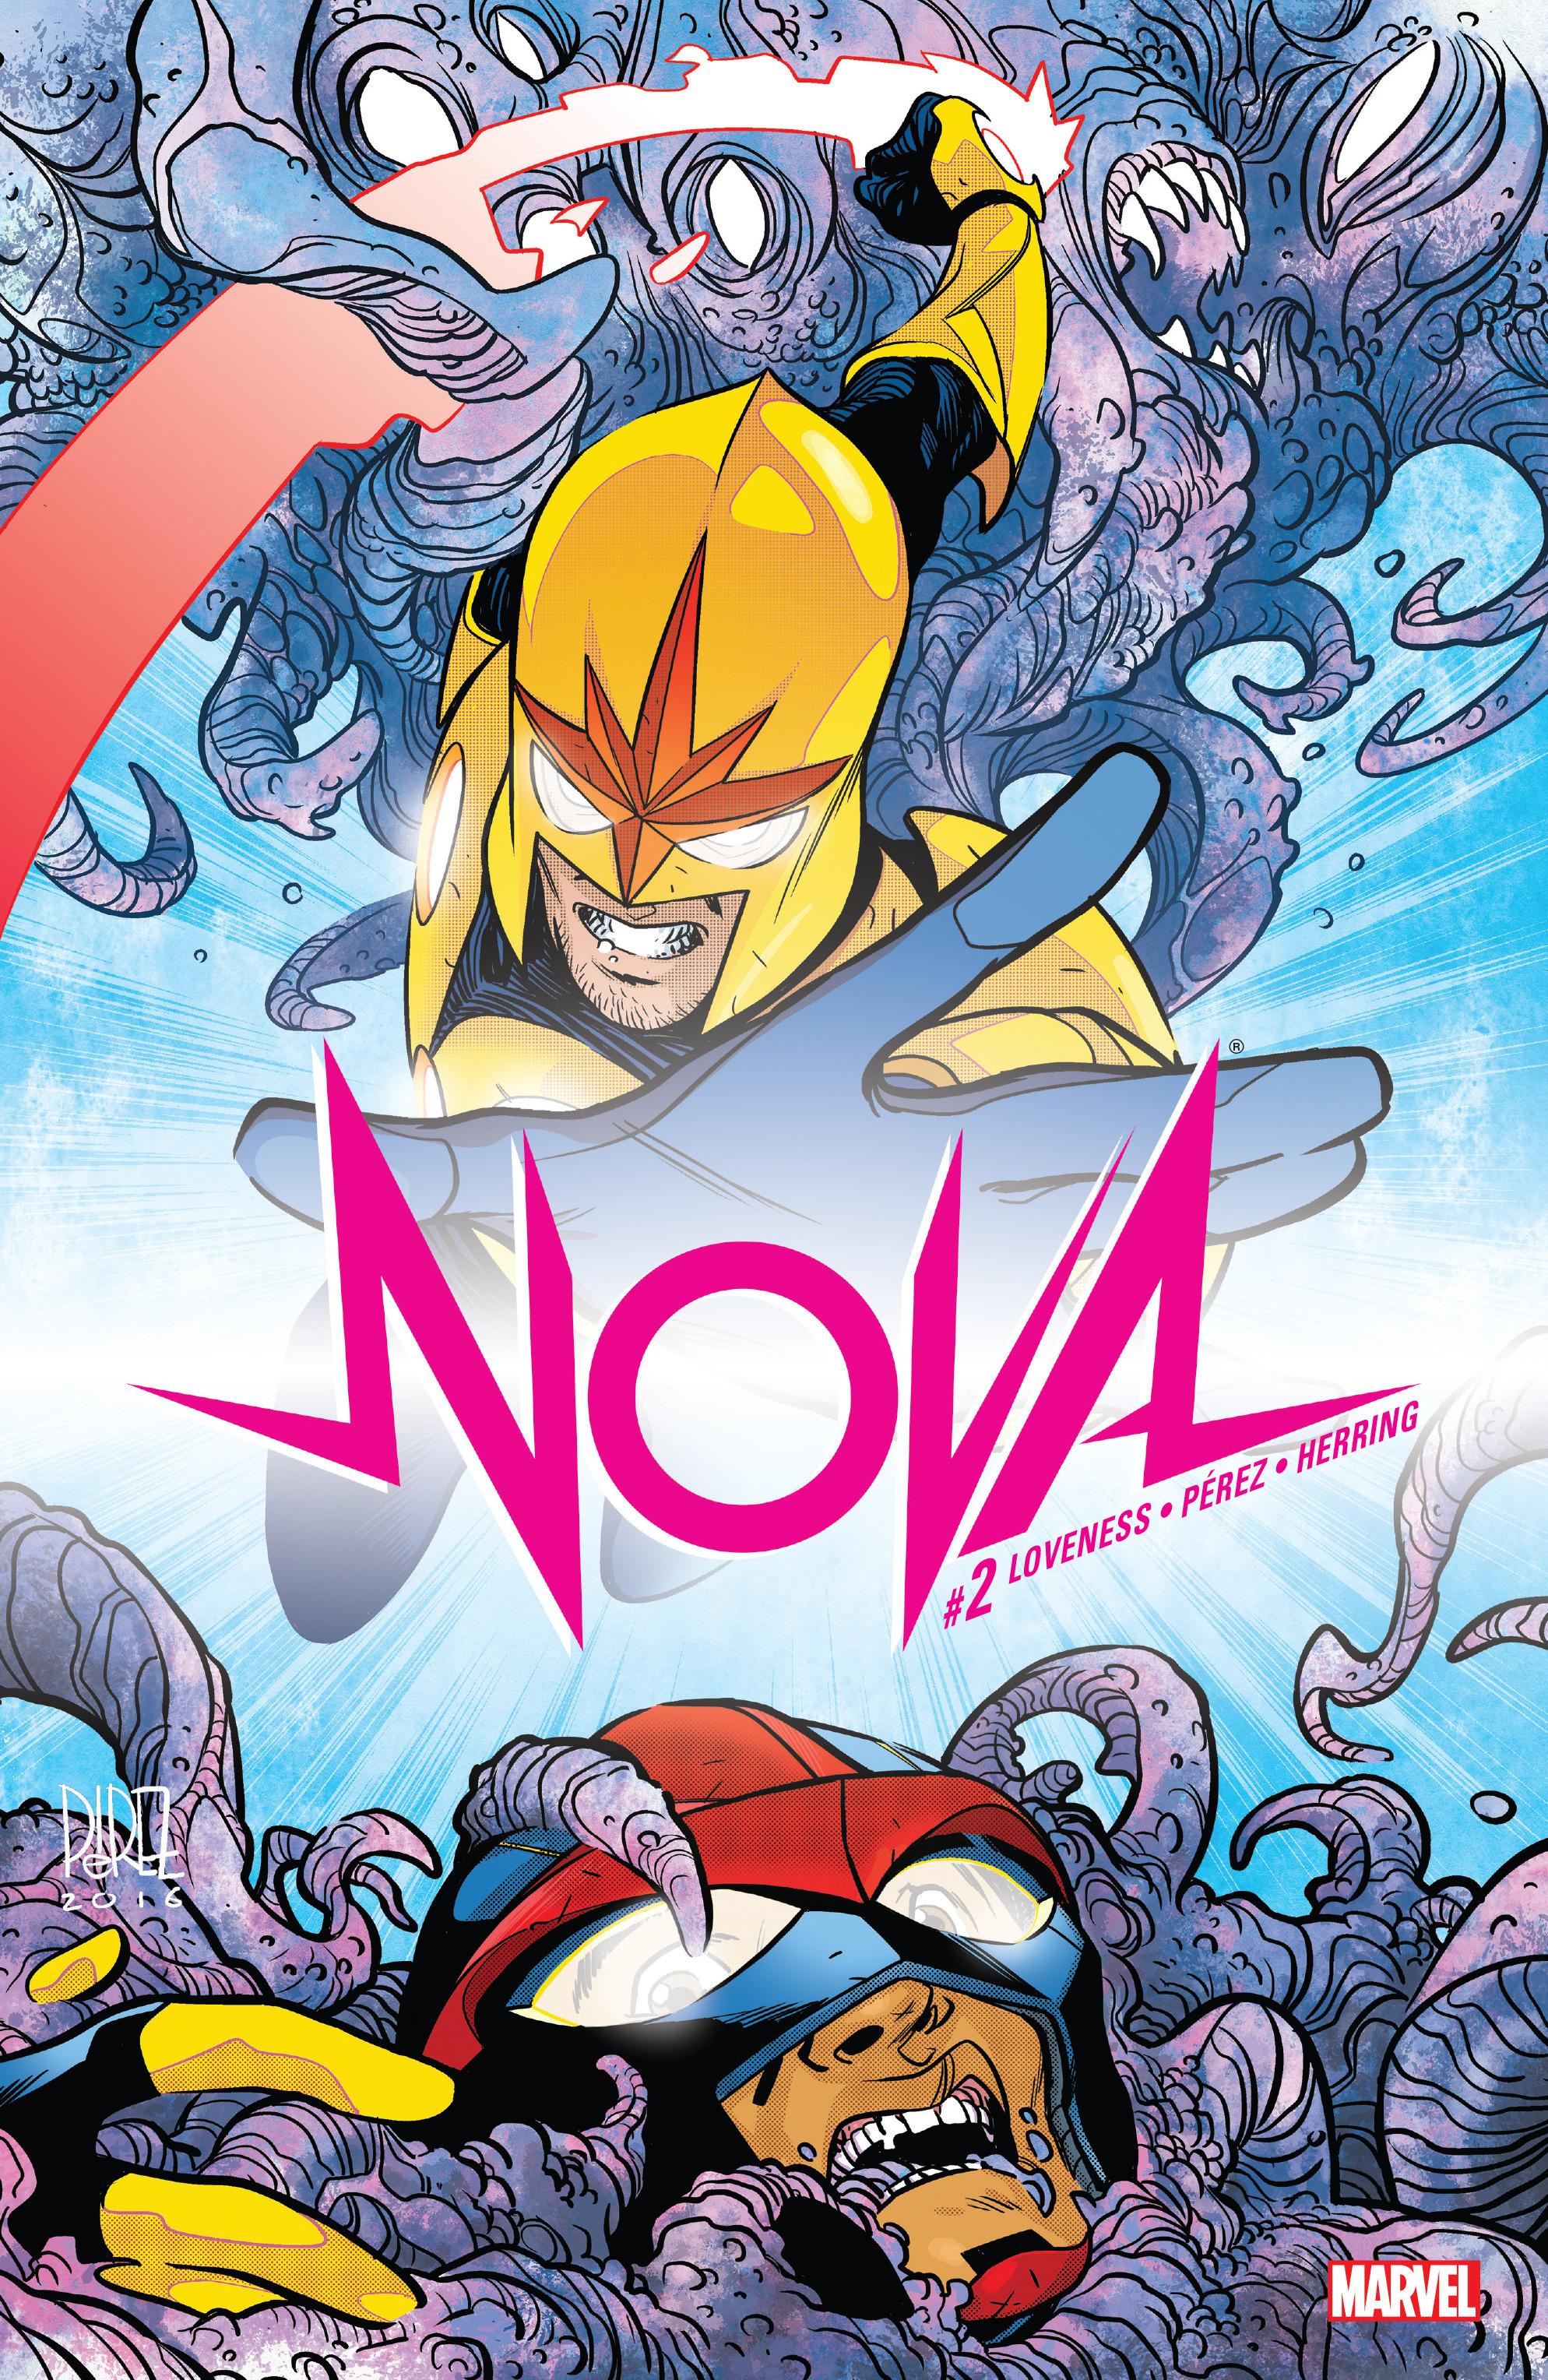 Nova (2017) issue 2 - Page 1